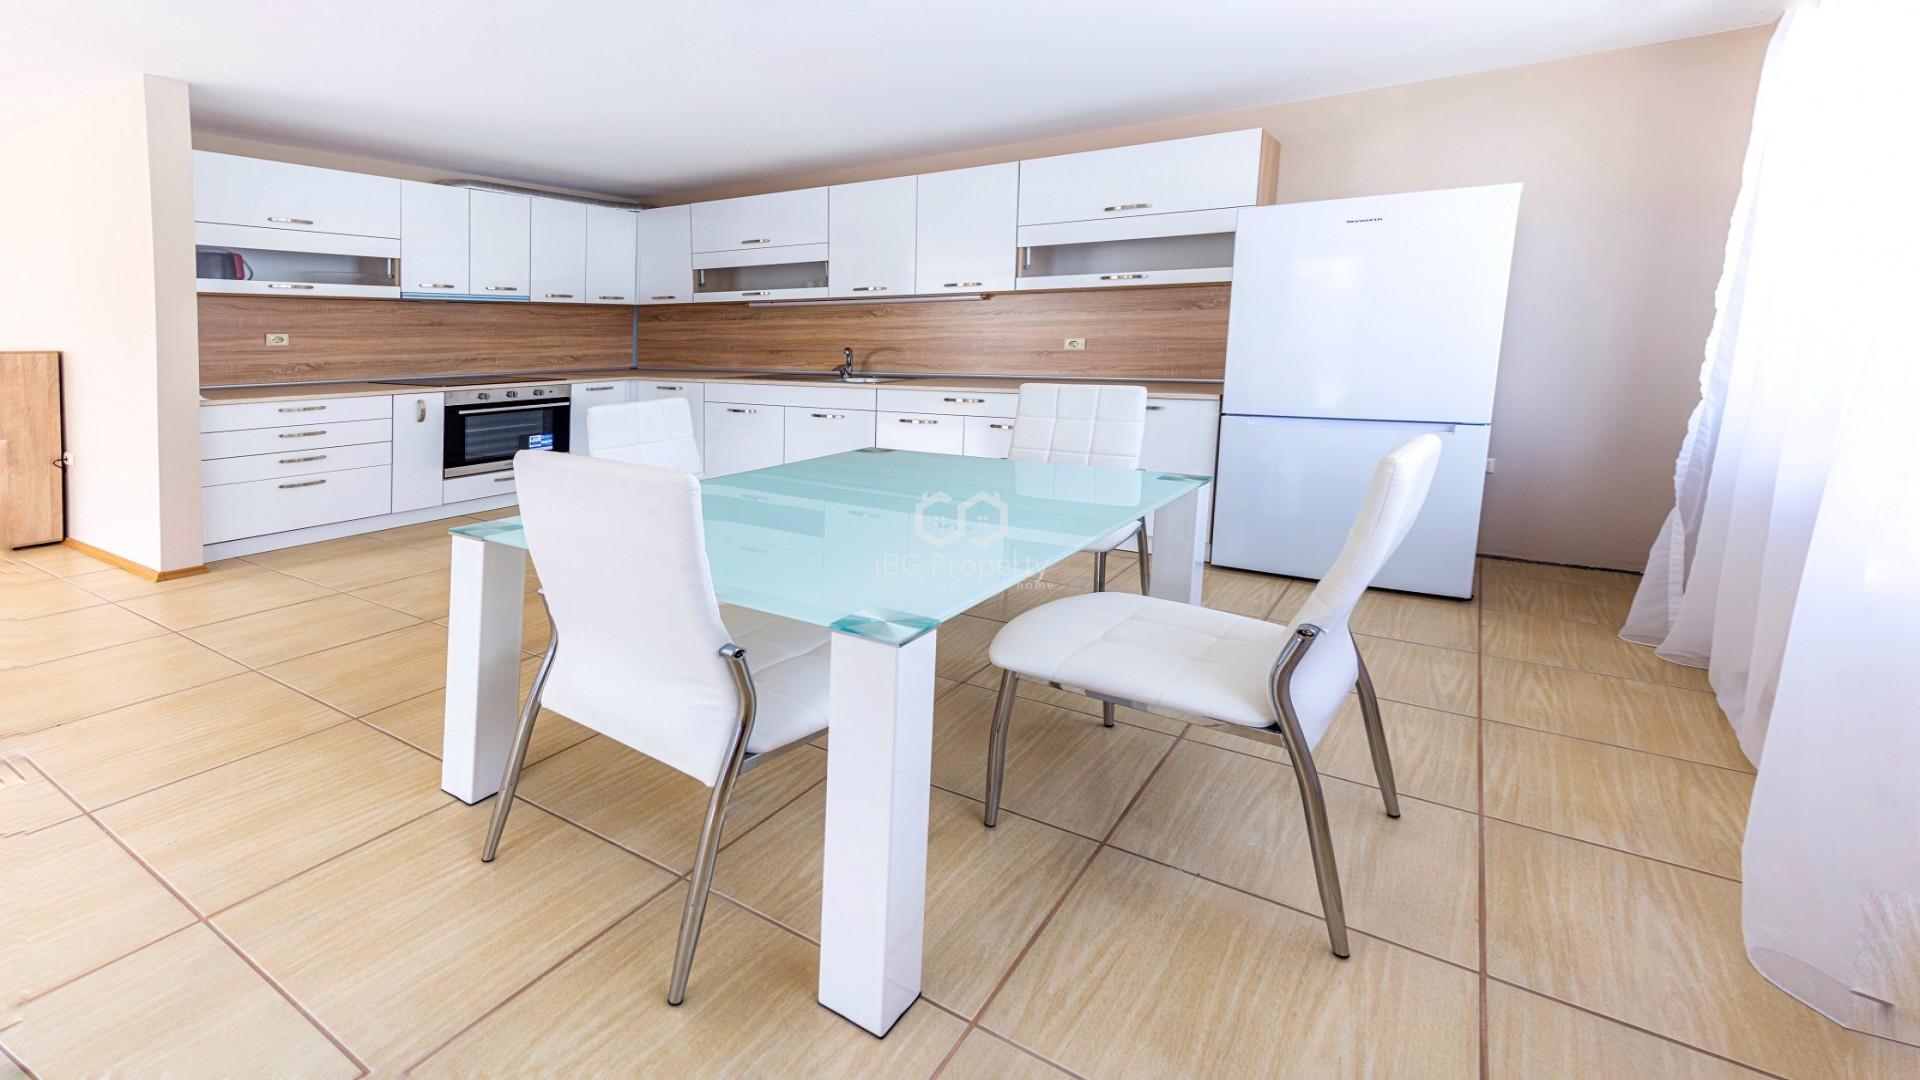 Тристаен апартамент Несебър 129 m2